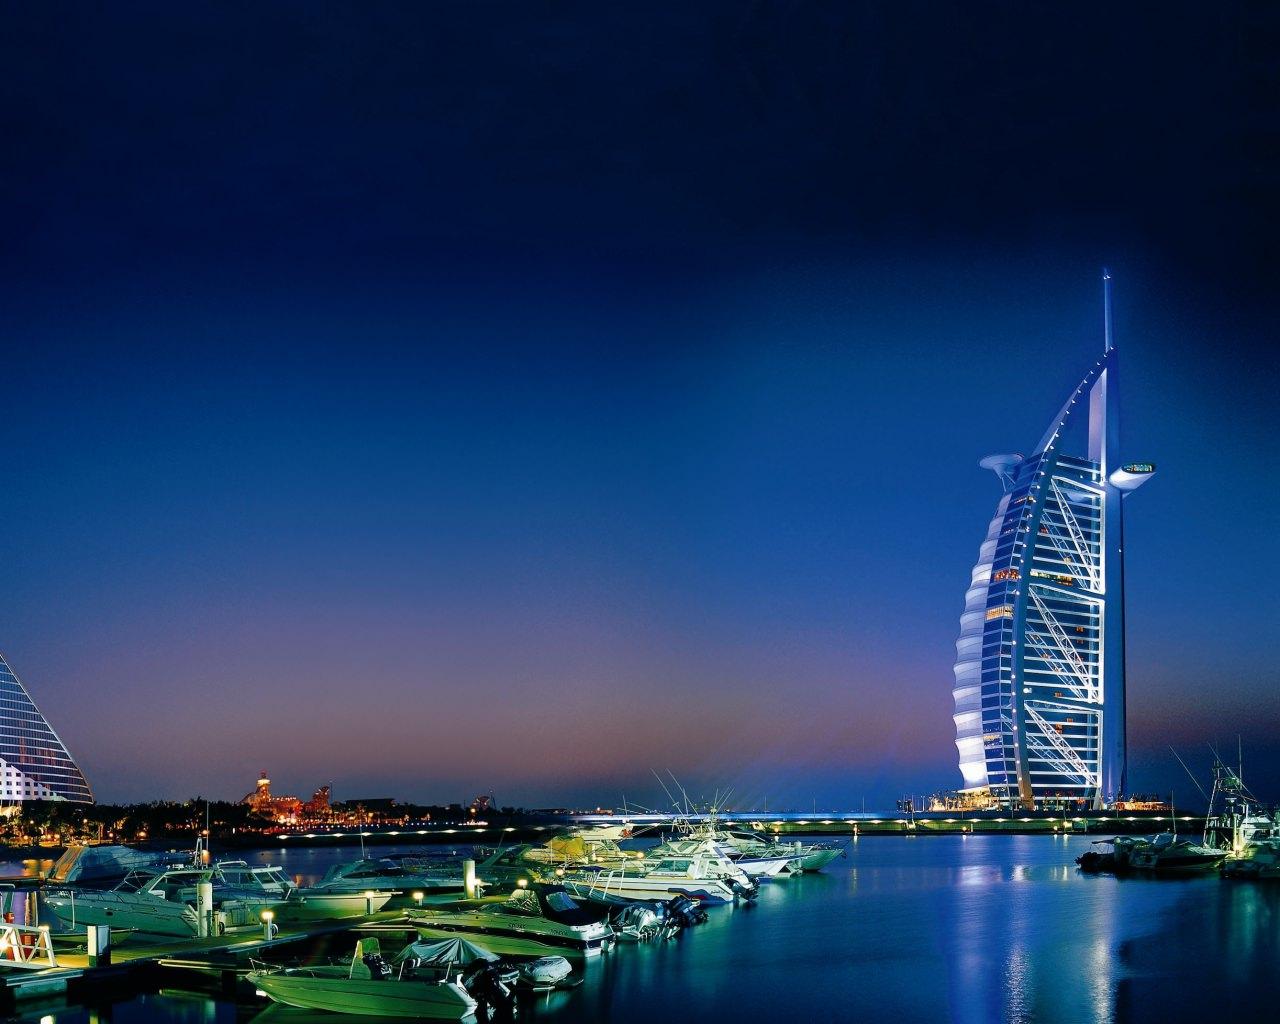 Emirates Wallpaper Hd 20 Beautiful Cityscape Wallpapers Freecreatives